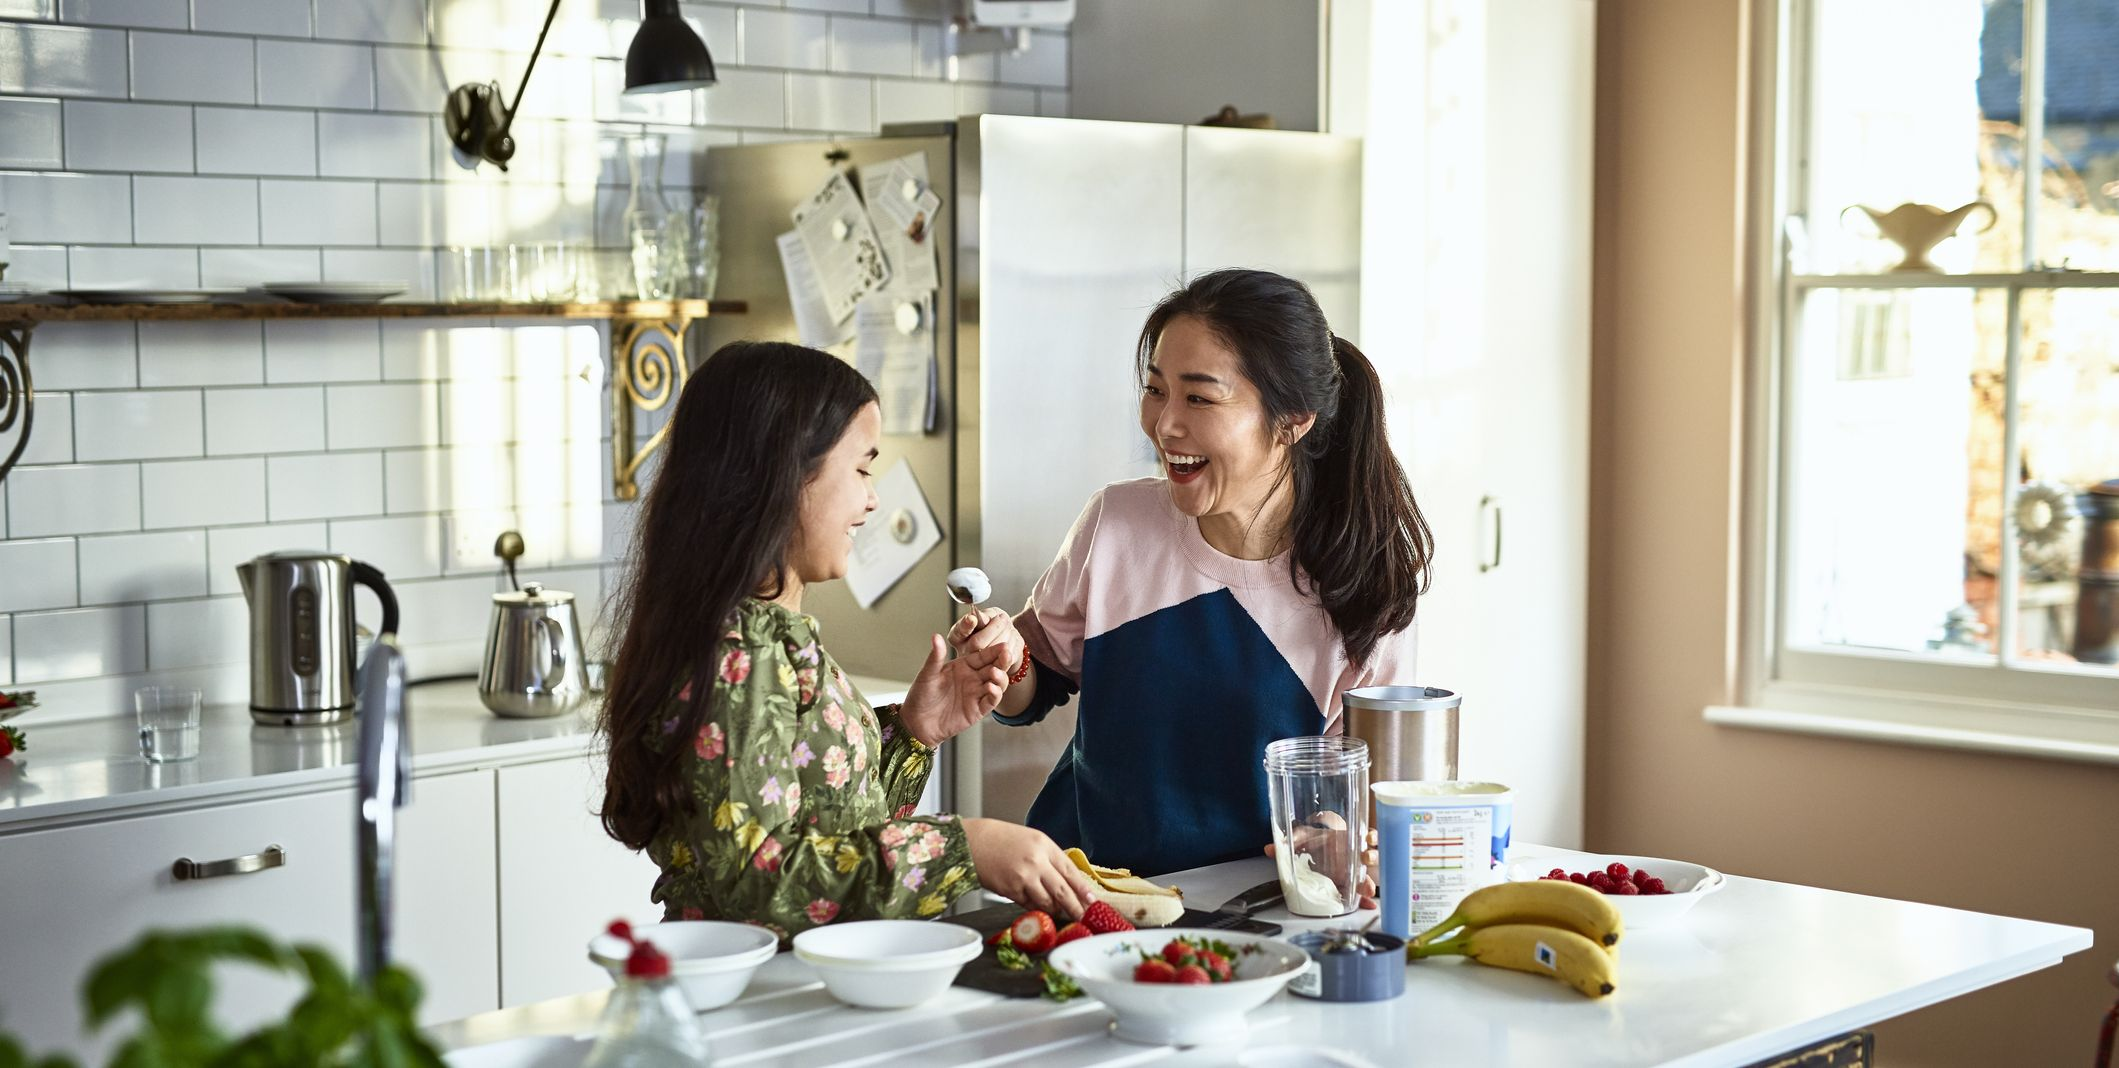 mothers day-2019 - women's heath uk